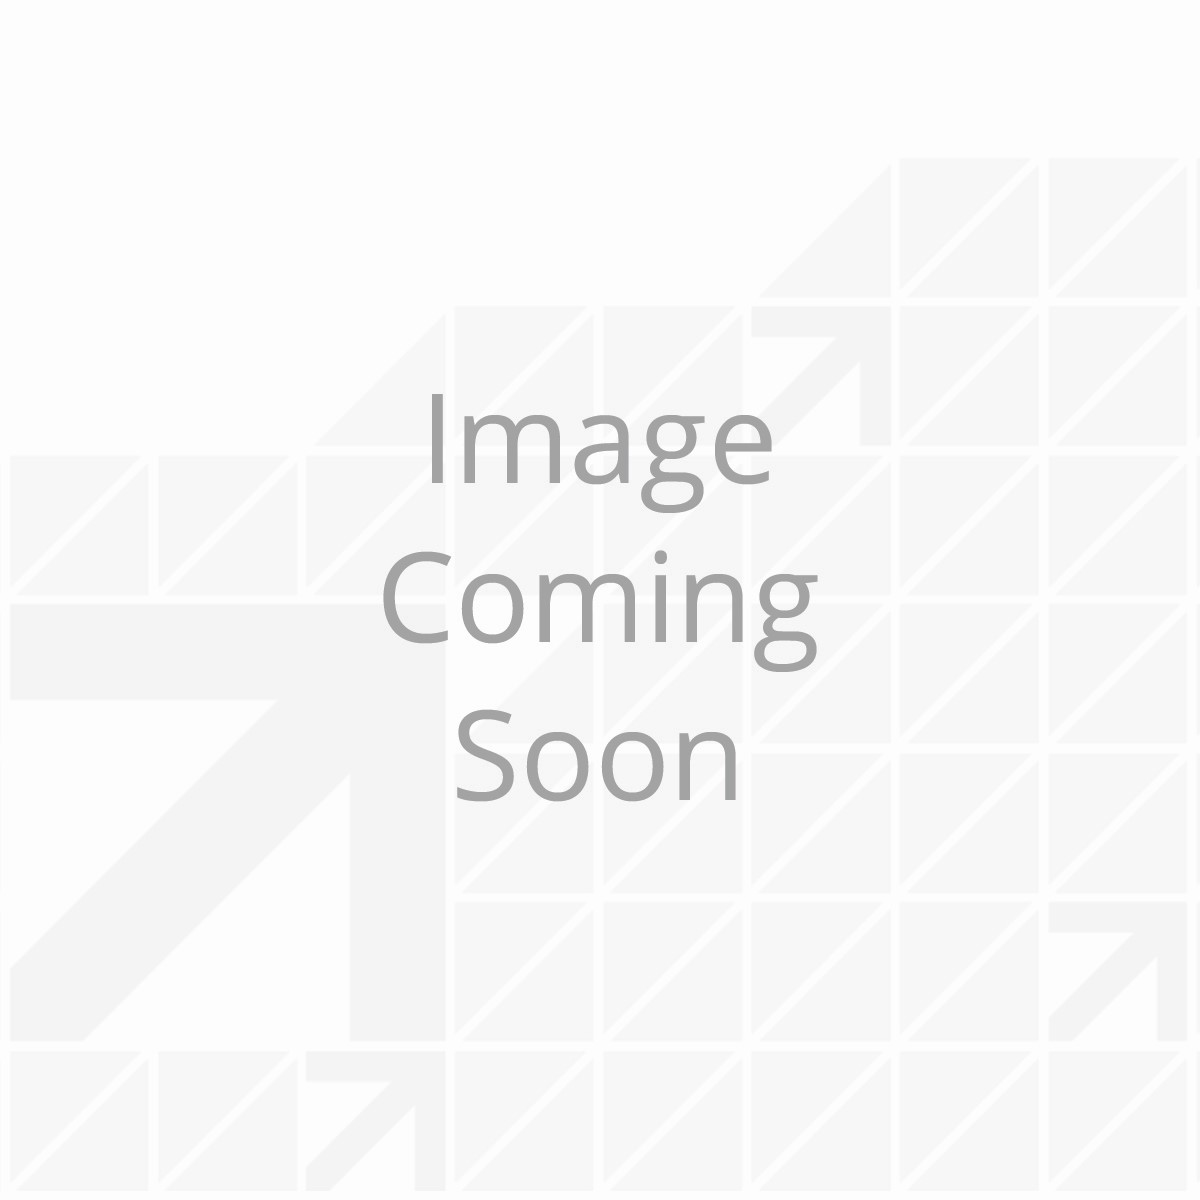 30A LED Cordset - 50' (Yellow)